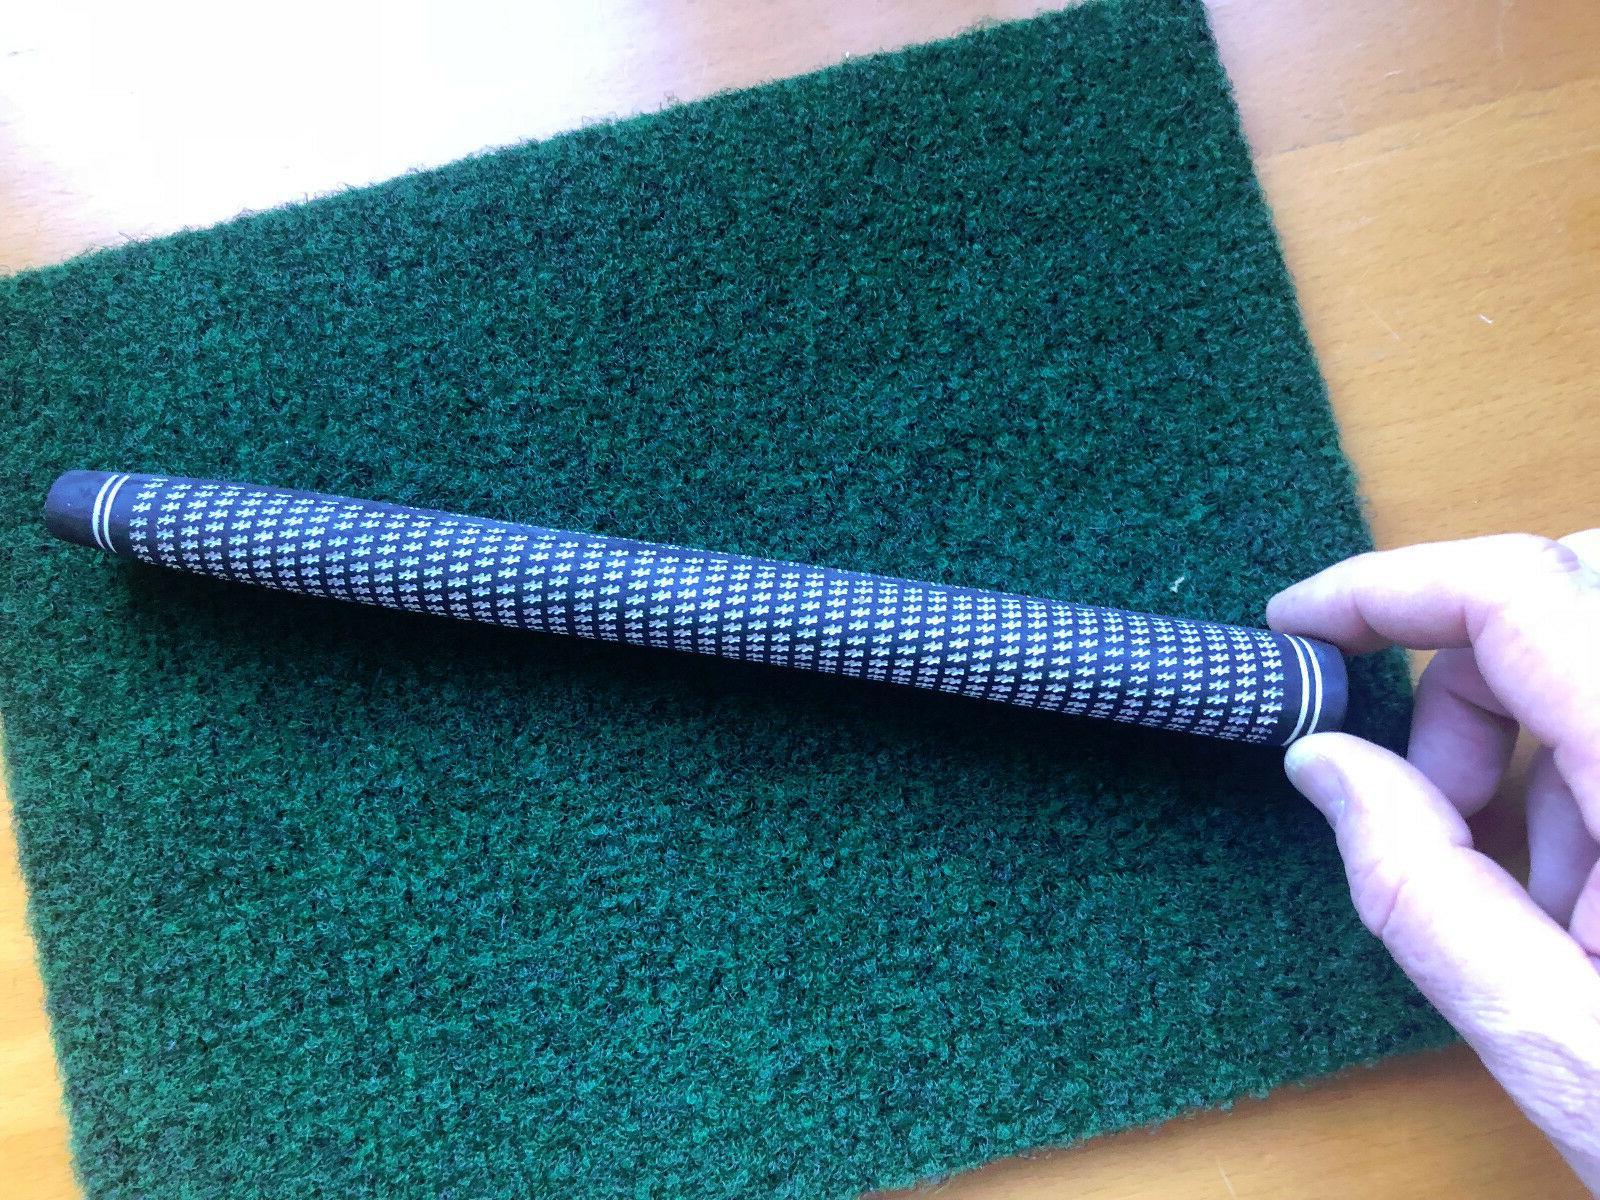 NEW! Single Crossline Paddle Putter - Black/White